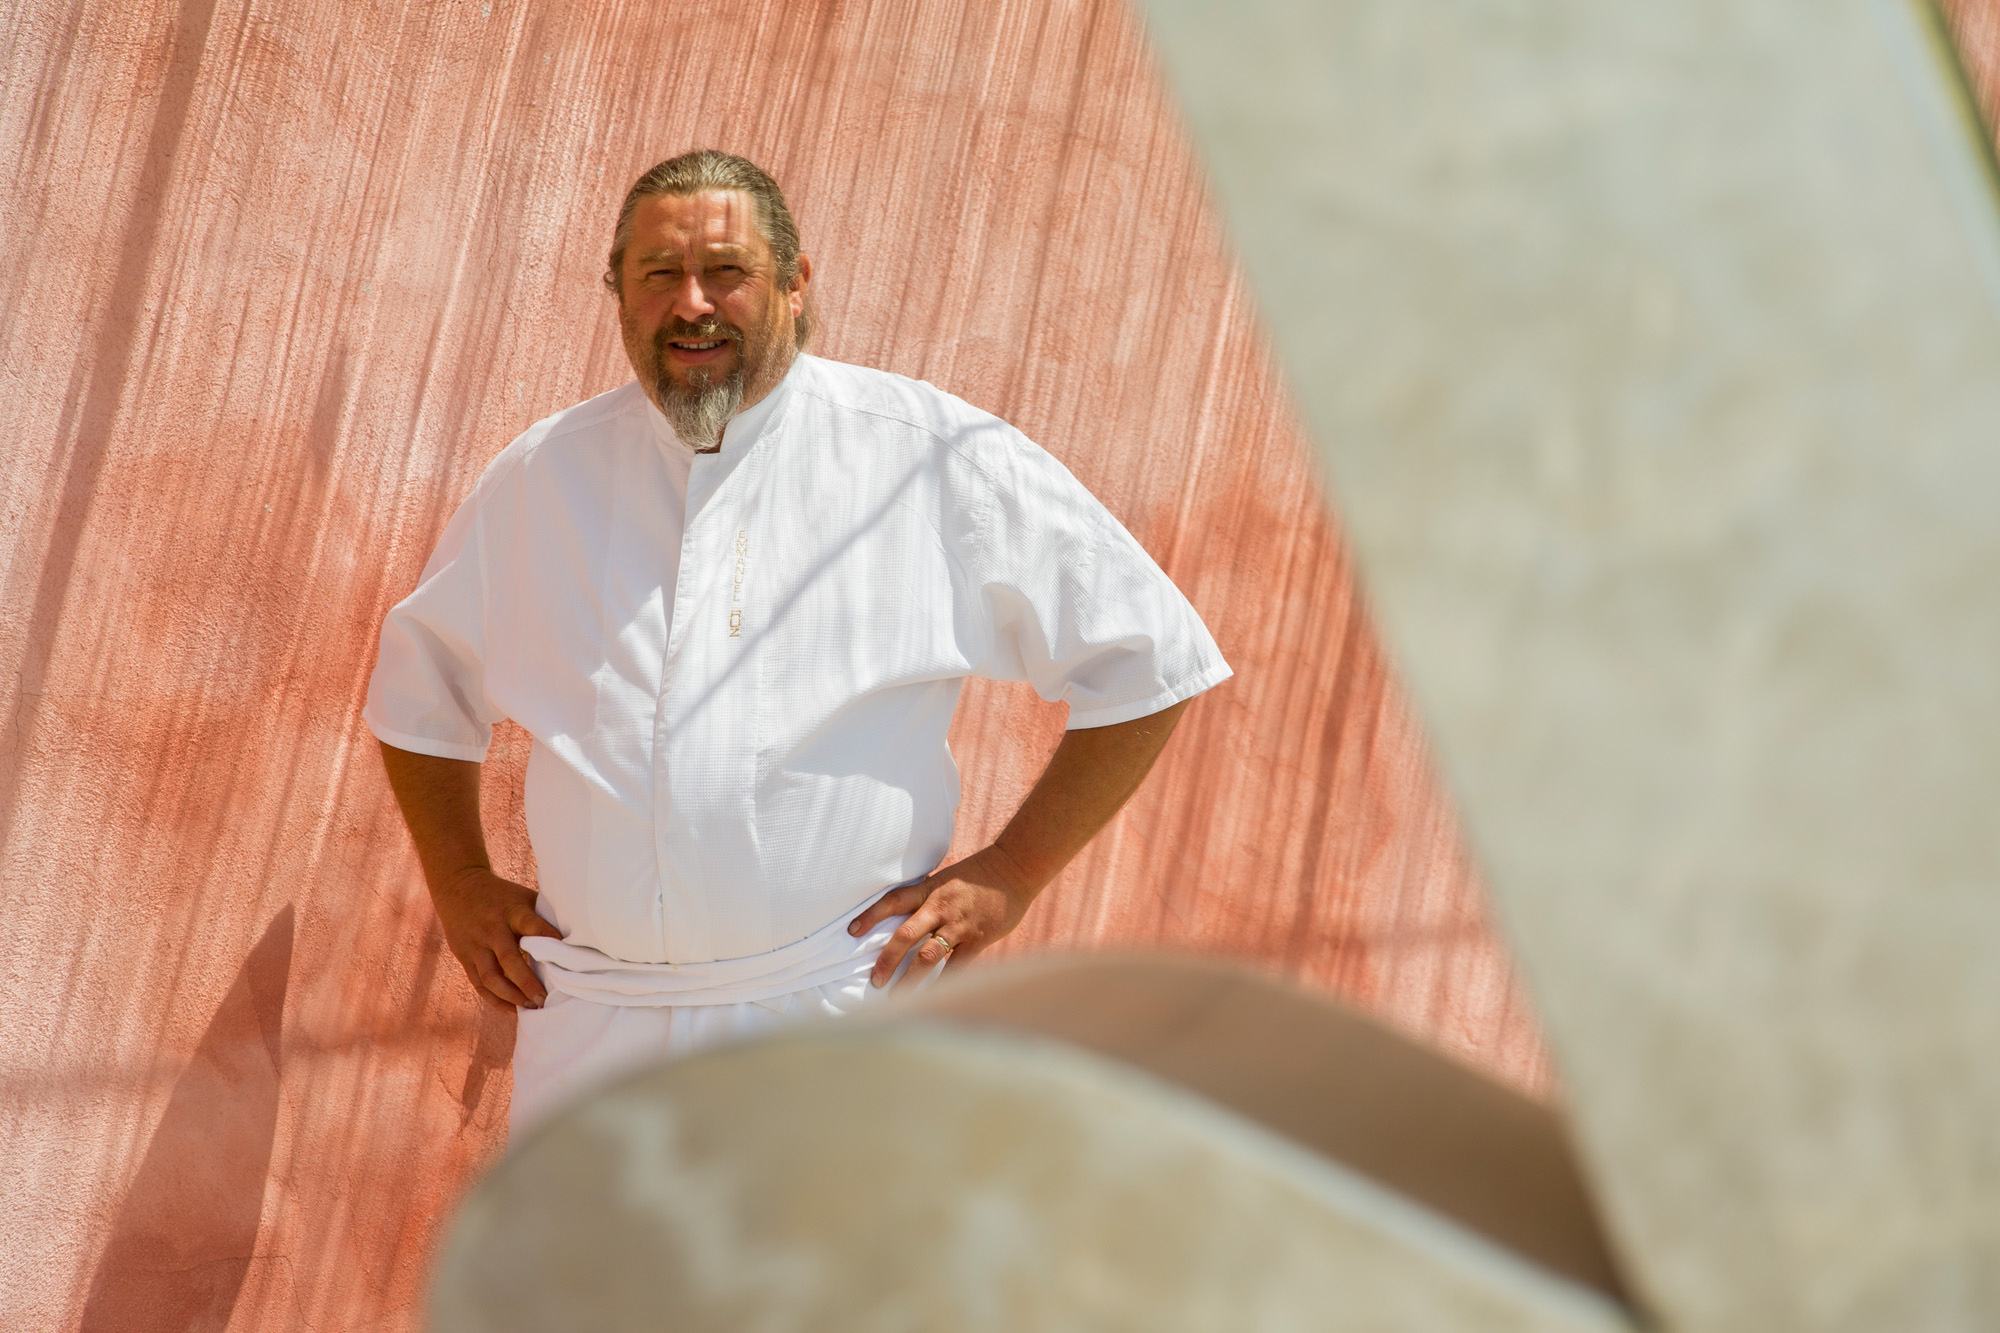 Chef Emmanuel Ruz at Lou Fassum Restaurant Gastronomique, Grasse, France